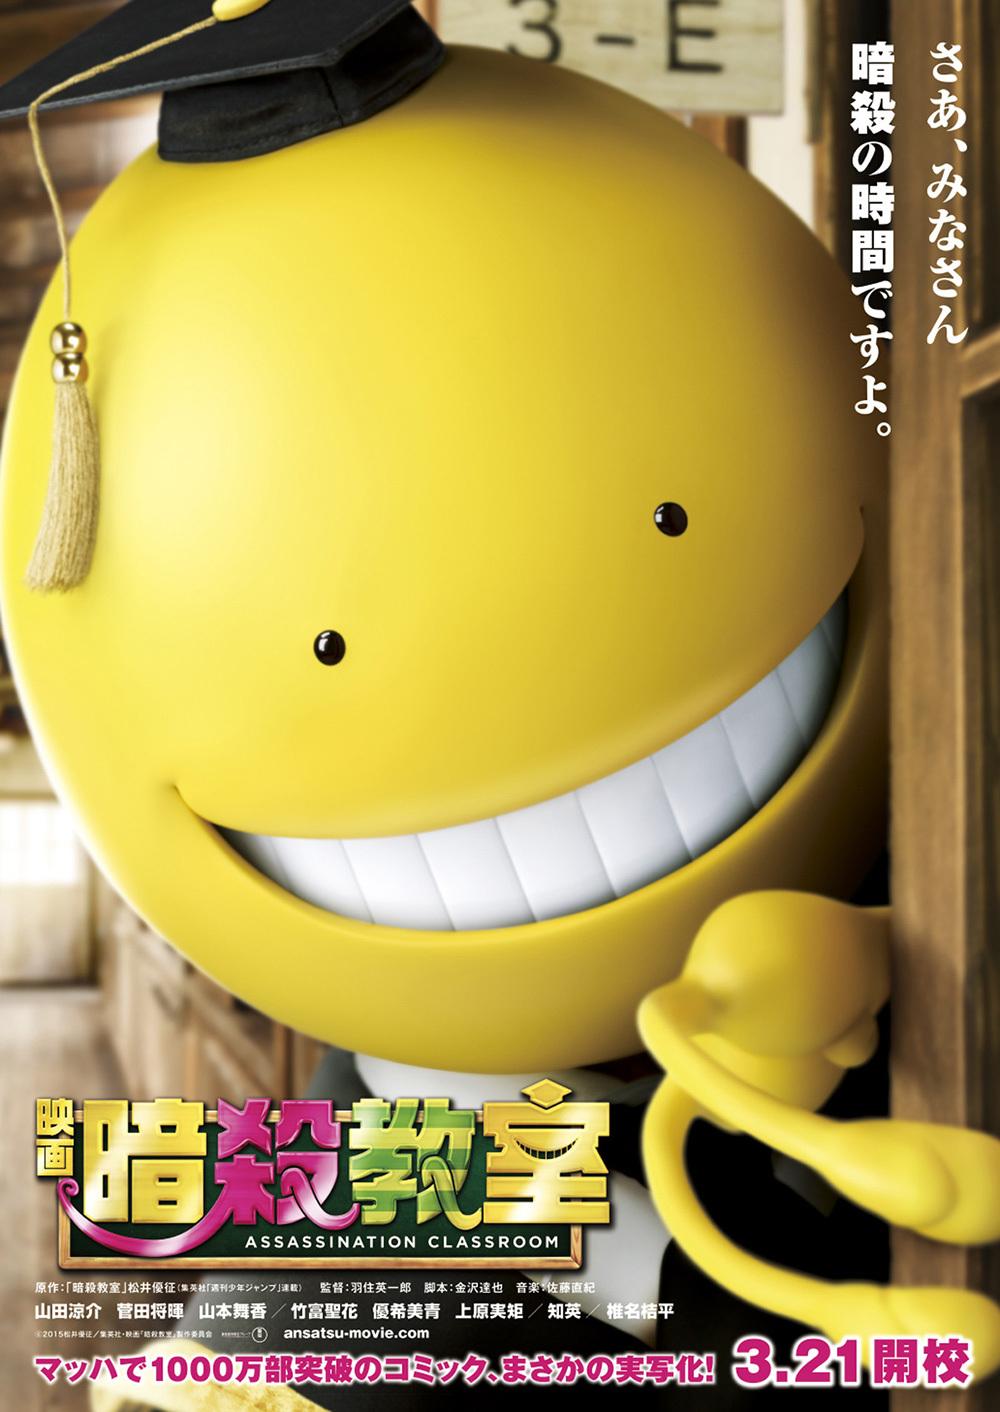 Ansatsu Kyoushitsu~Sotsugyou-hen~ (Assassination Classroom ~Graduation Edition~) live-action film visual